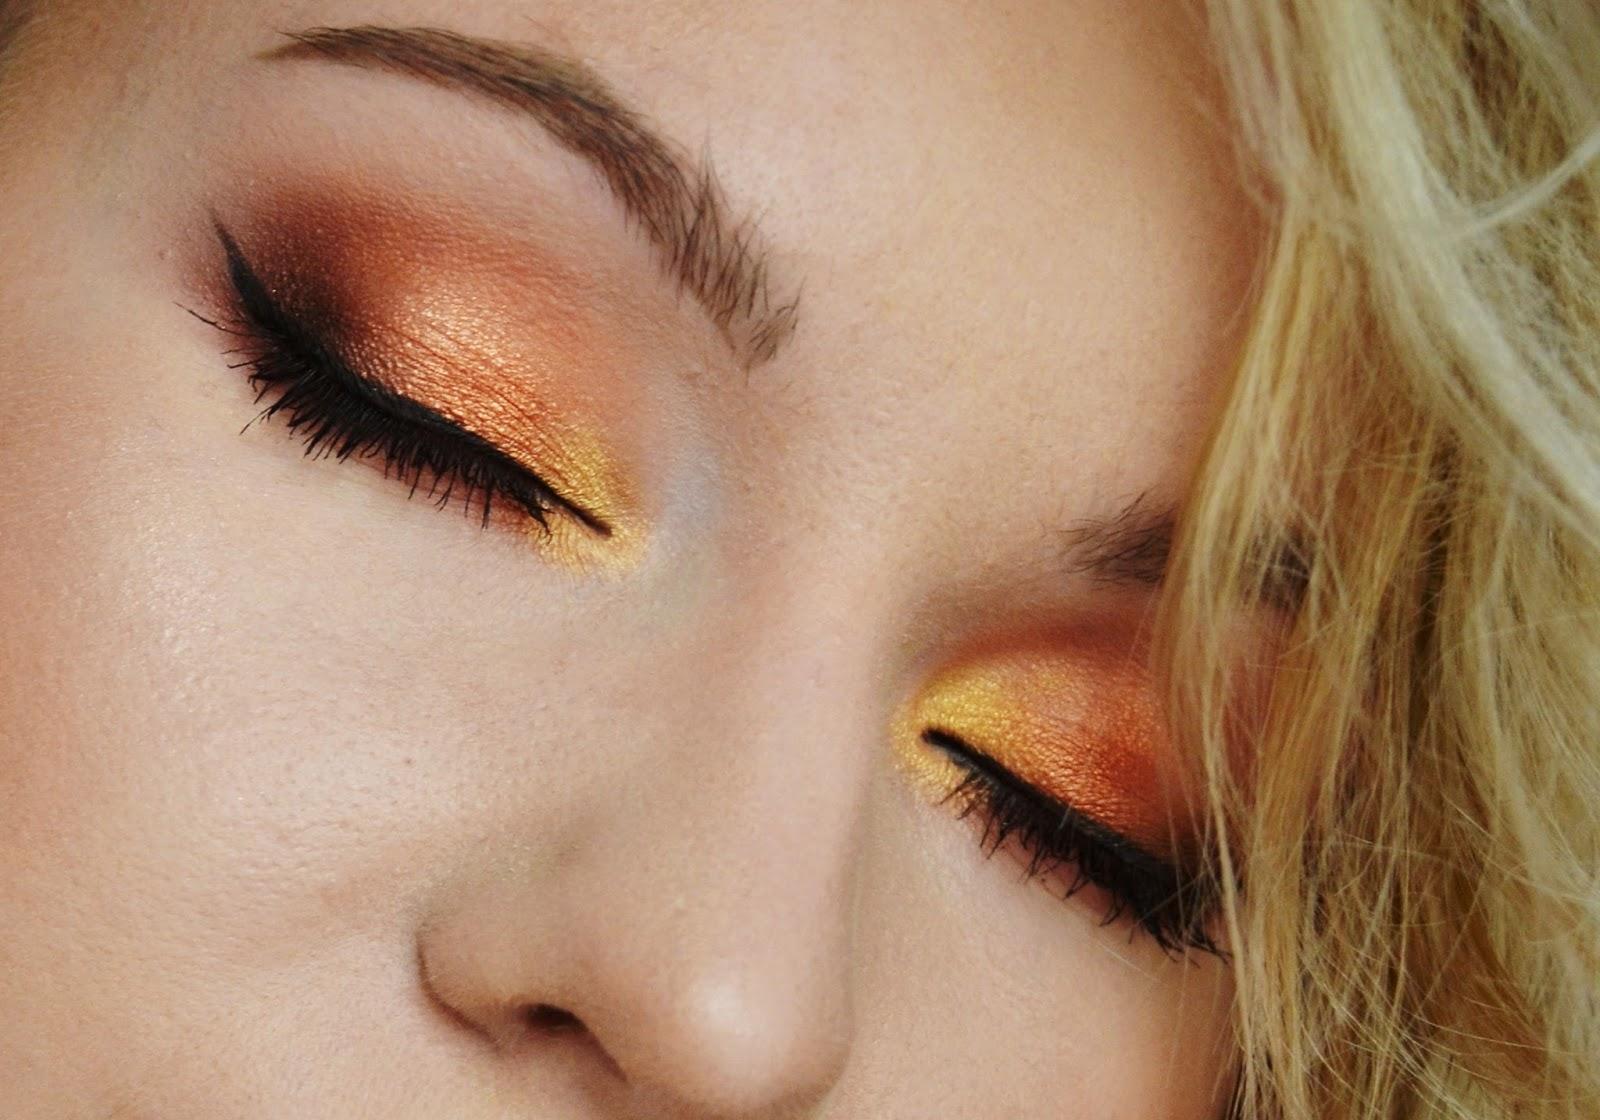 Caramel melange zoeva, najlepsze cienie, paleta cieni, caramel melange makijaż, paleta ciepłych cien, ciepły makijaż, makijaż dla niebieskich oczu